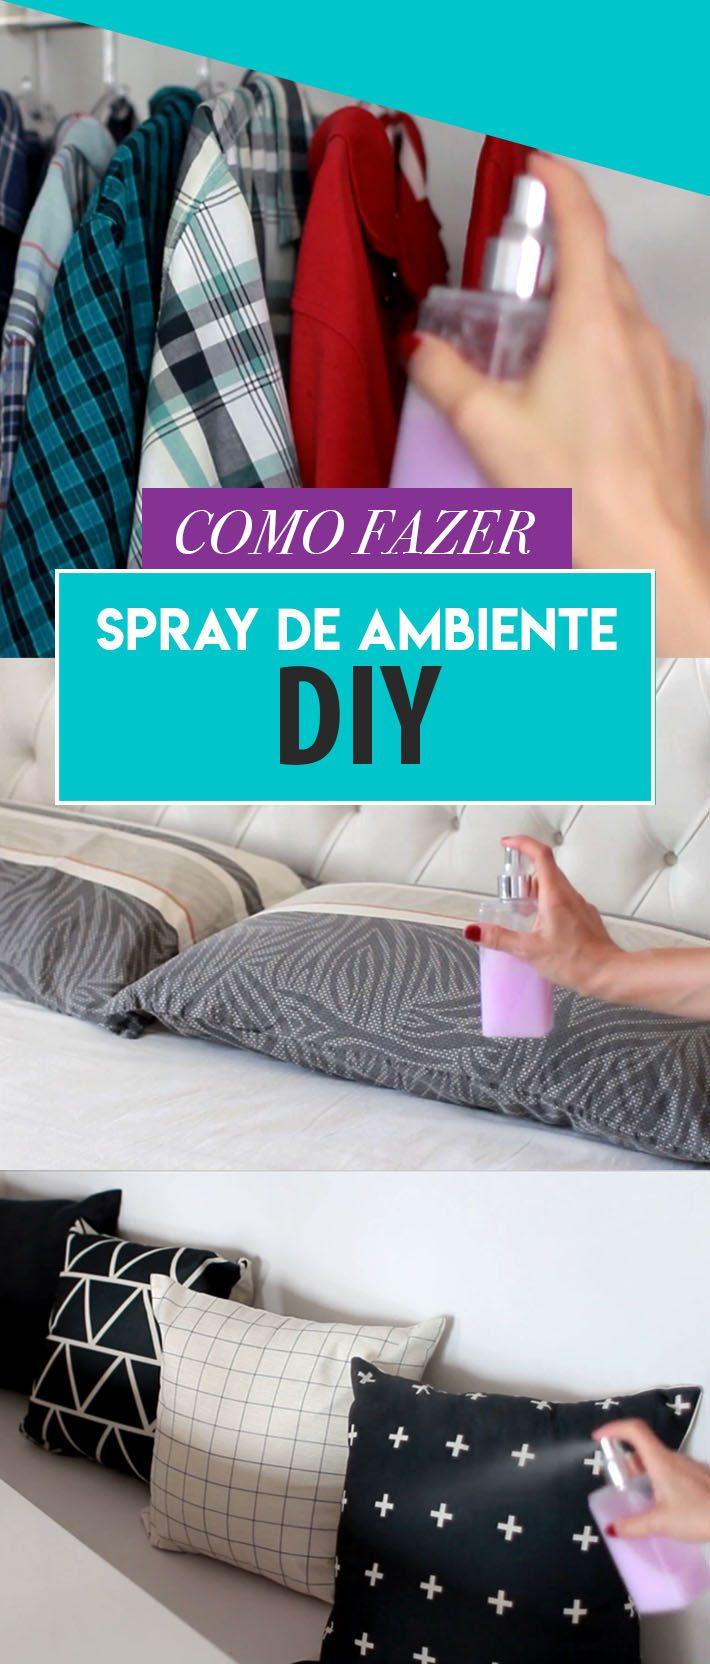 Como fazer spray de ambiente | DIY